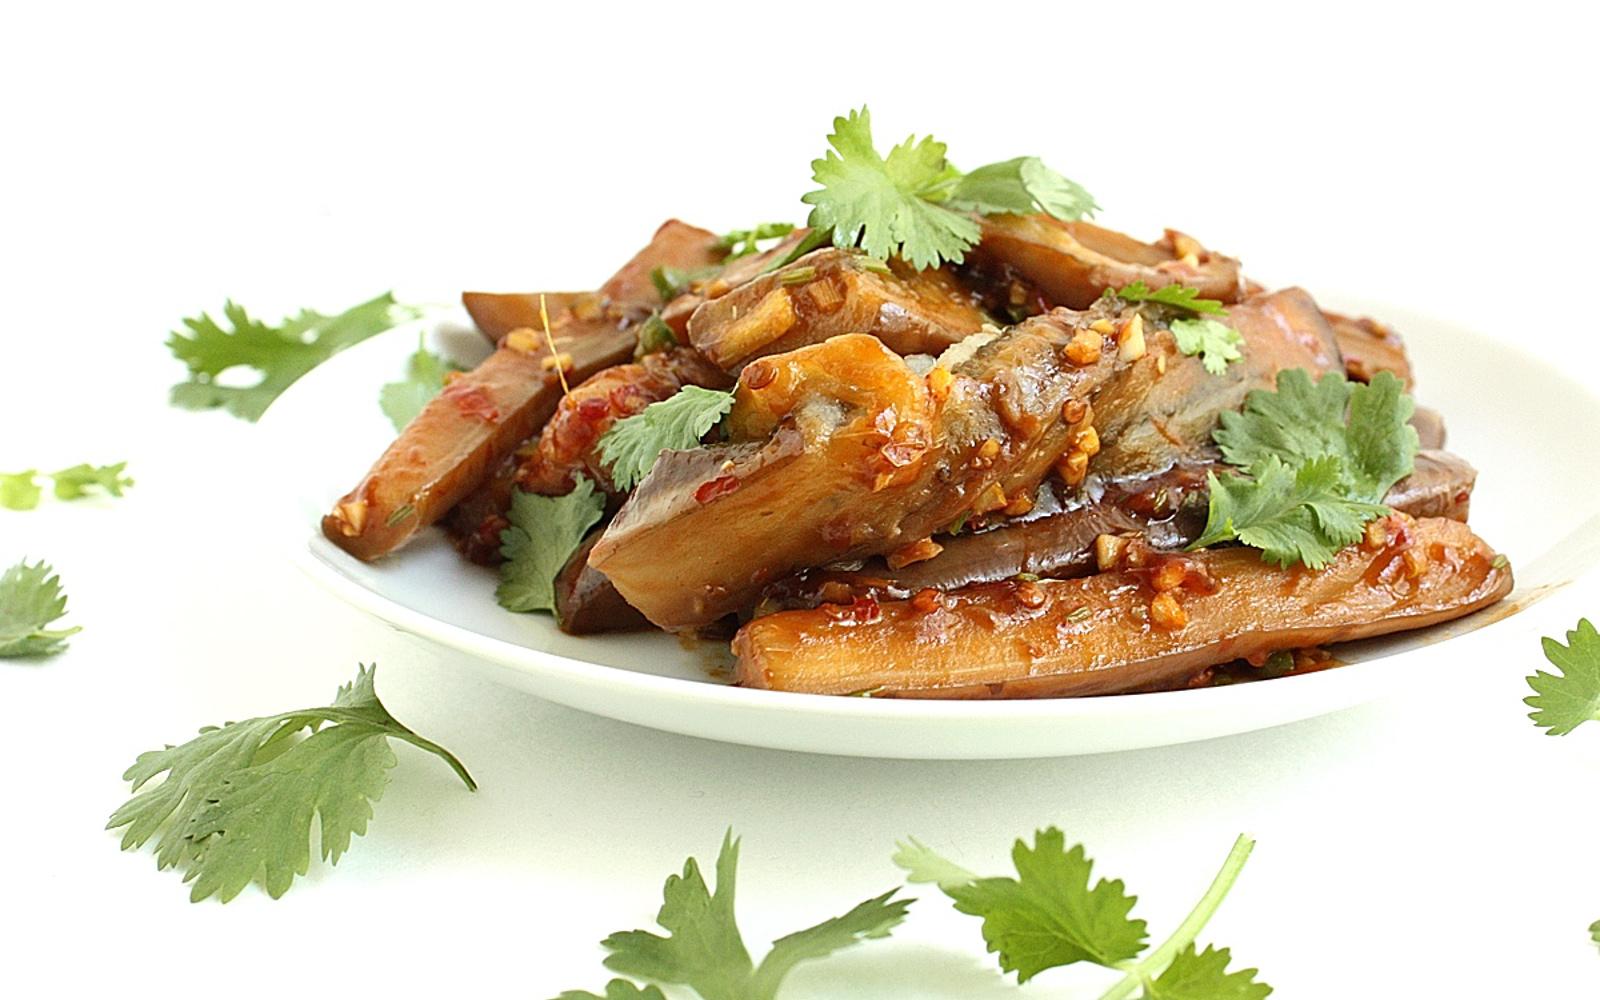 Spicy Sichuan Eggplant